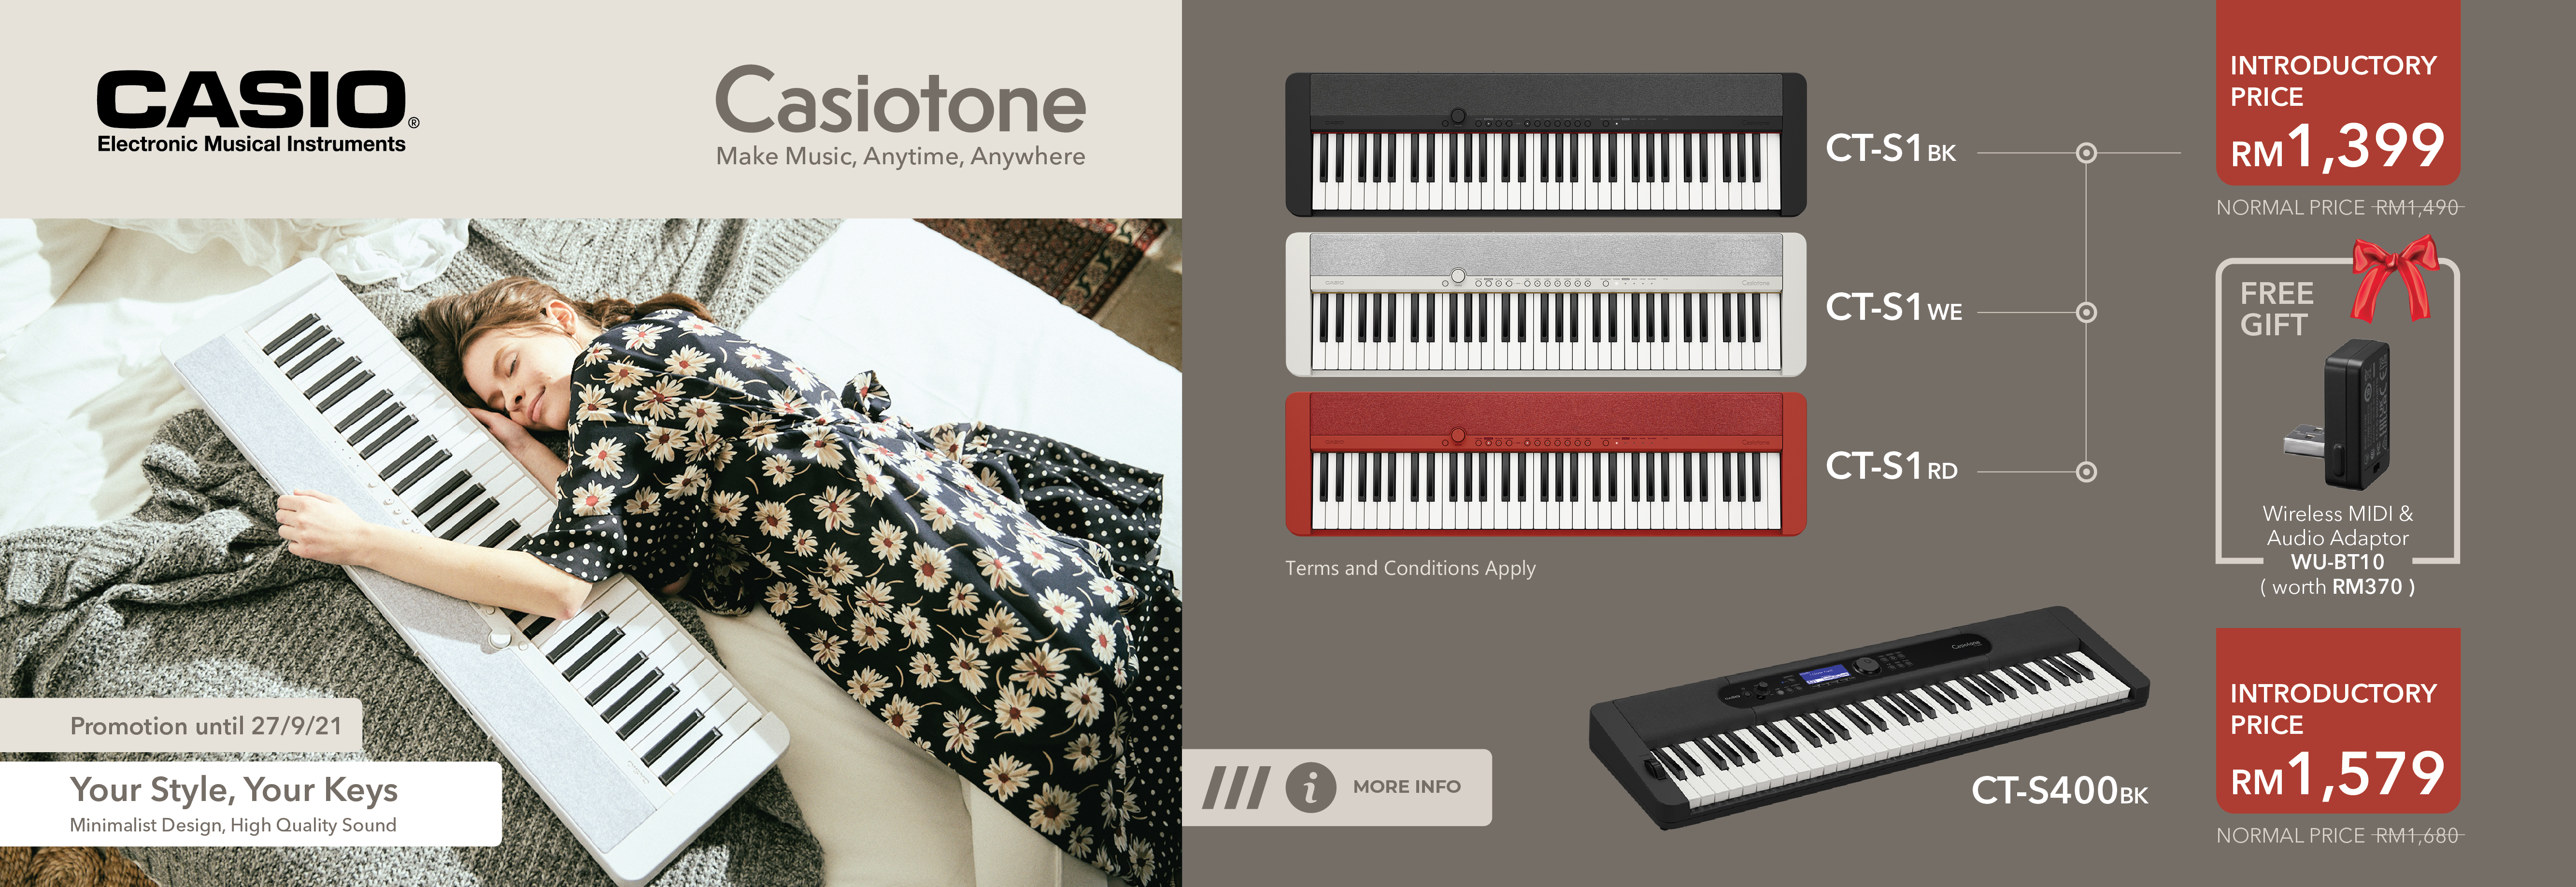 New Casiotone Intro Promo